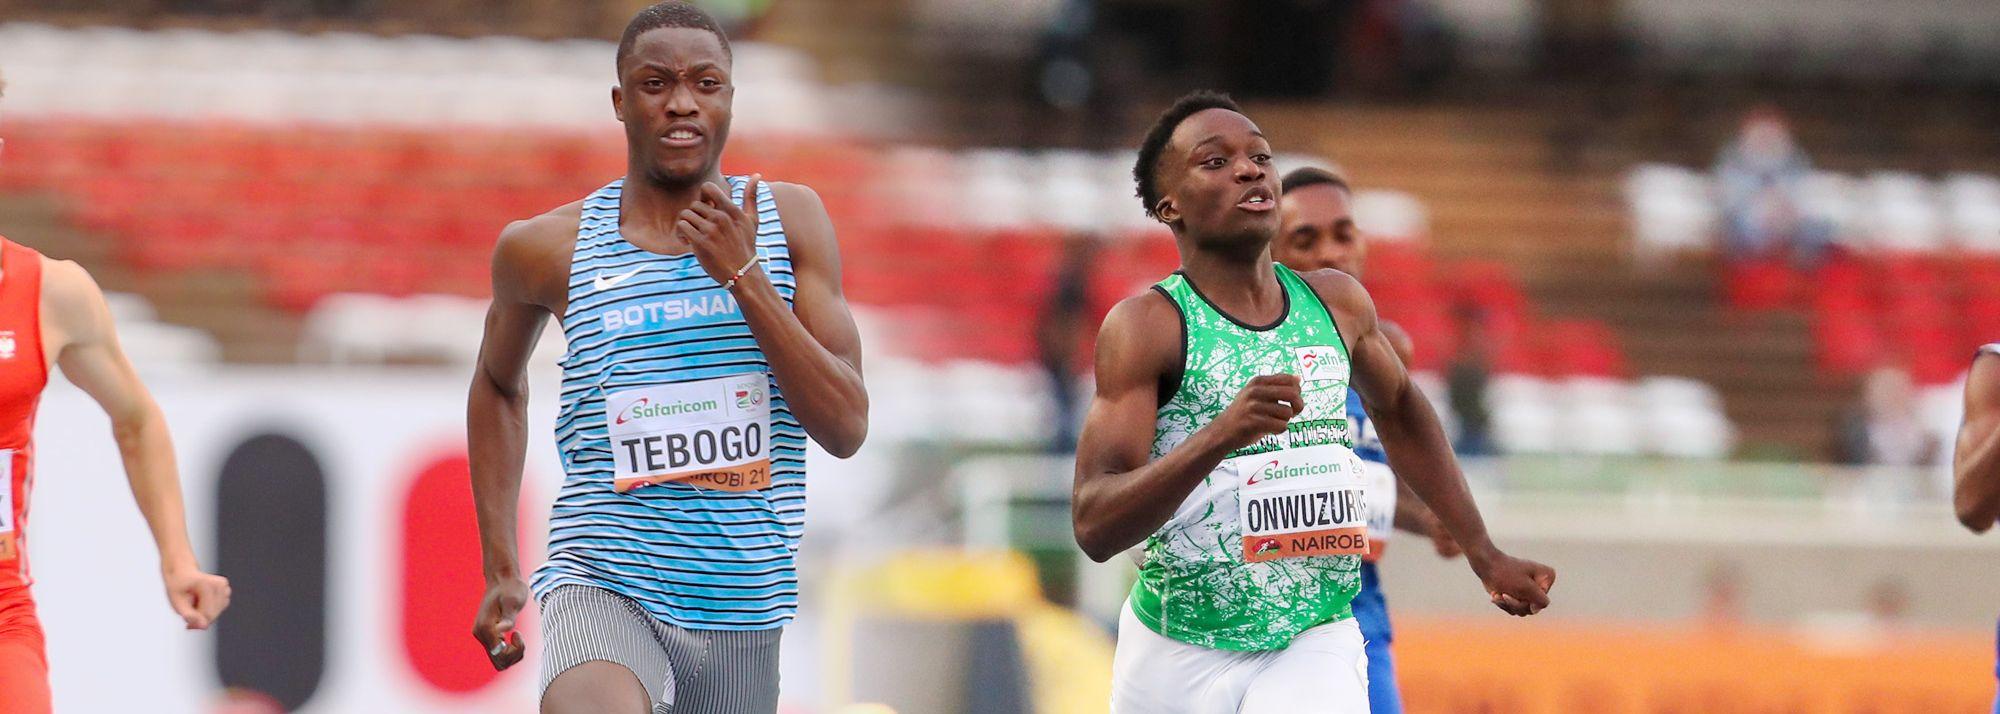 Young African sprint stars emerge at World U20 Championships Nairobi 21